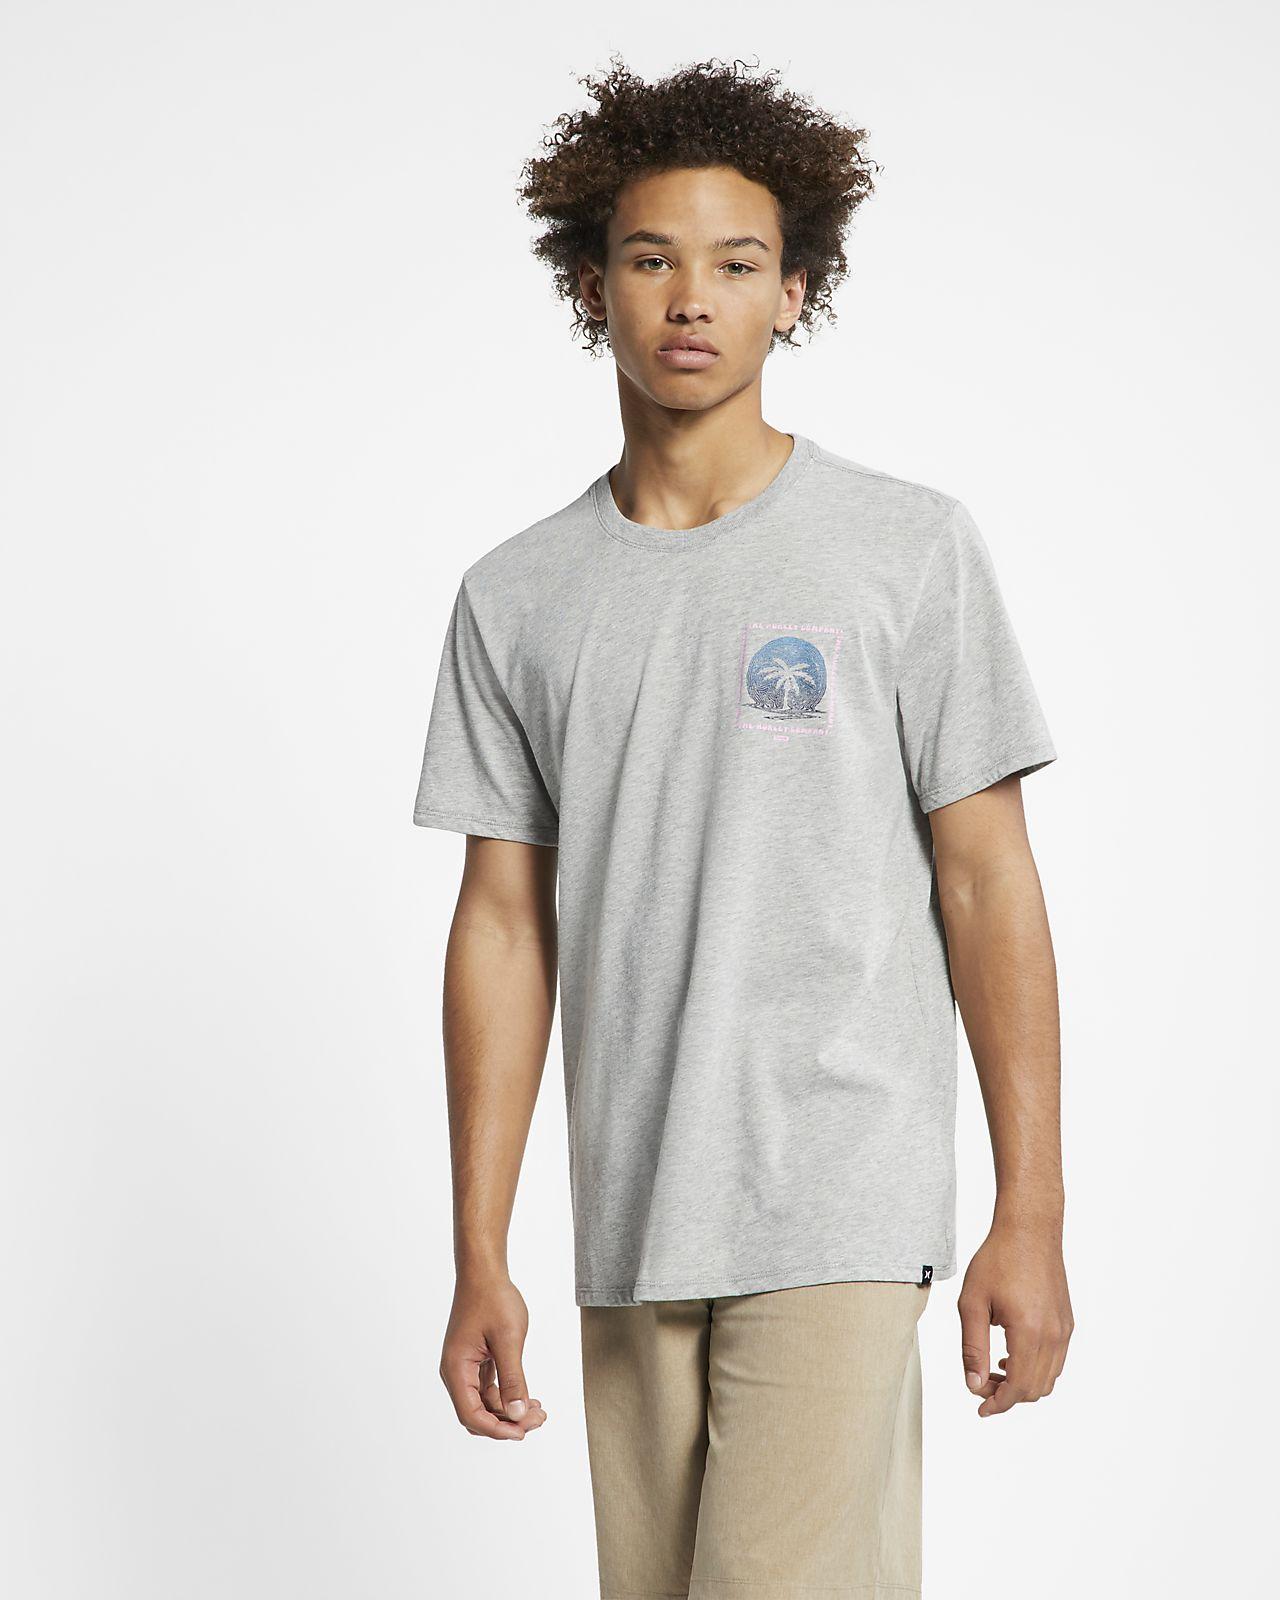 Hurley Dri-FIT Trippy Palms Herren-T-Shirt